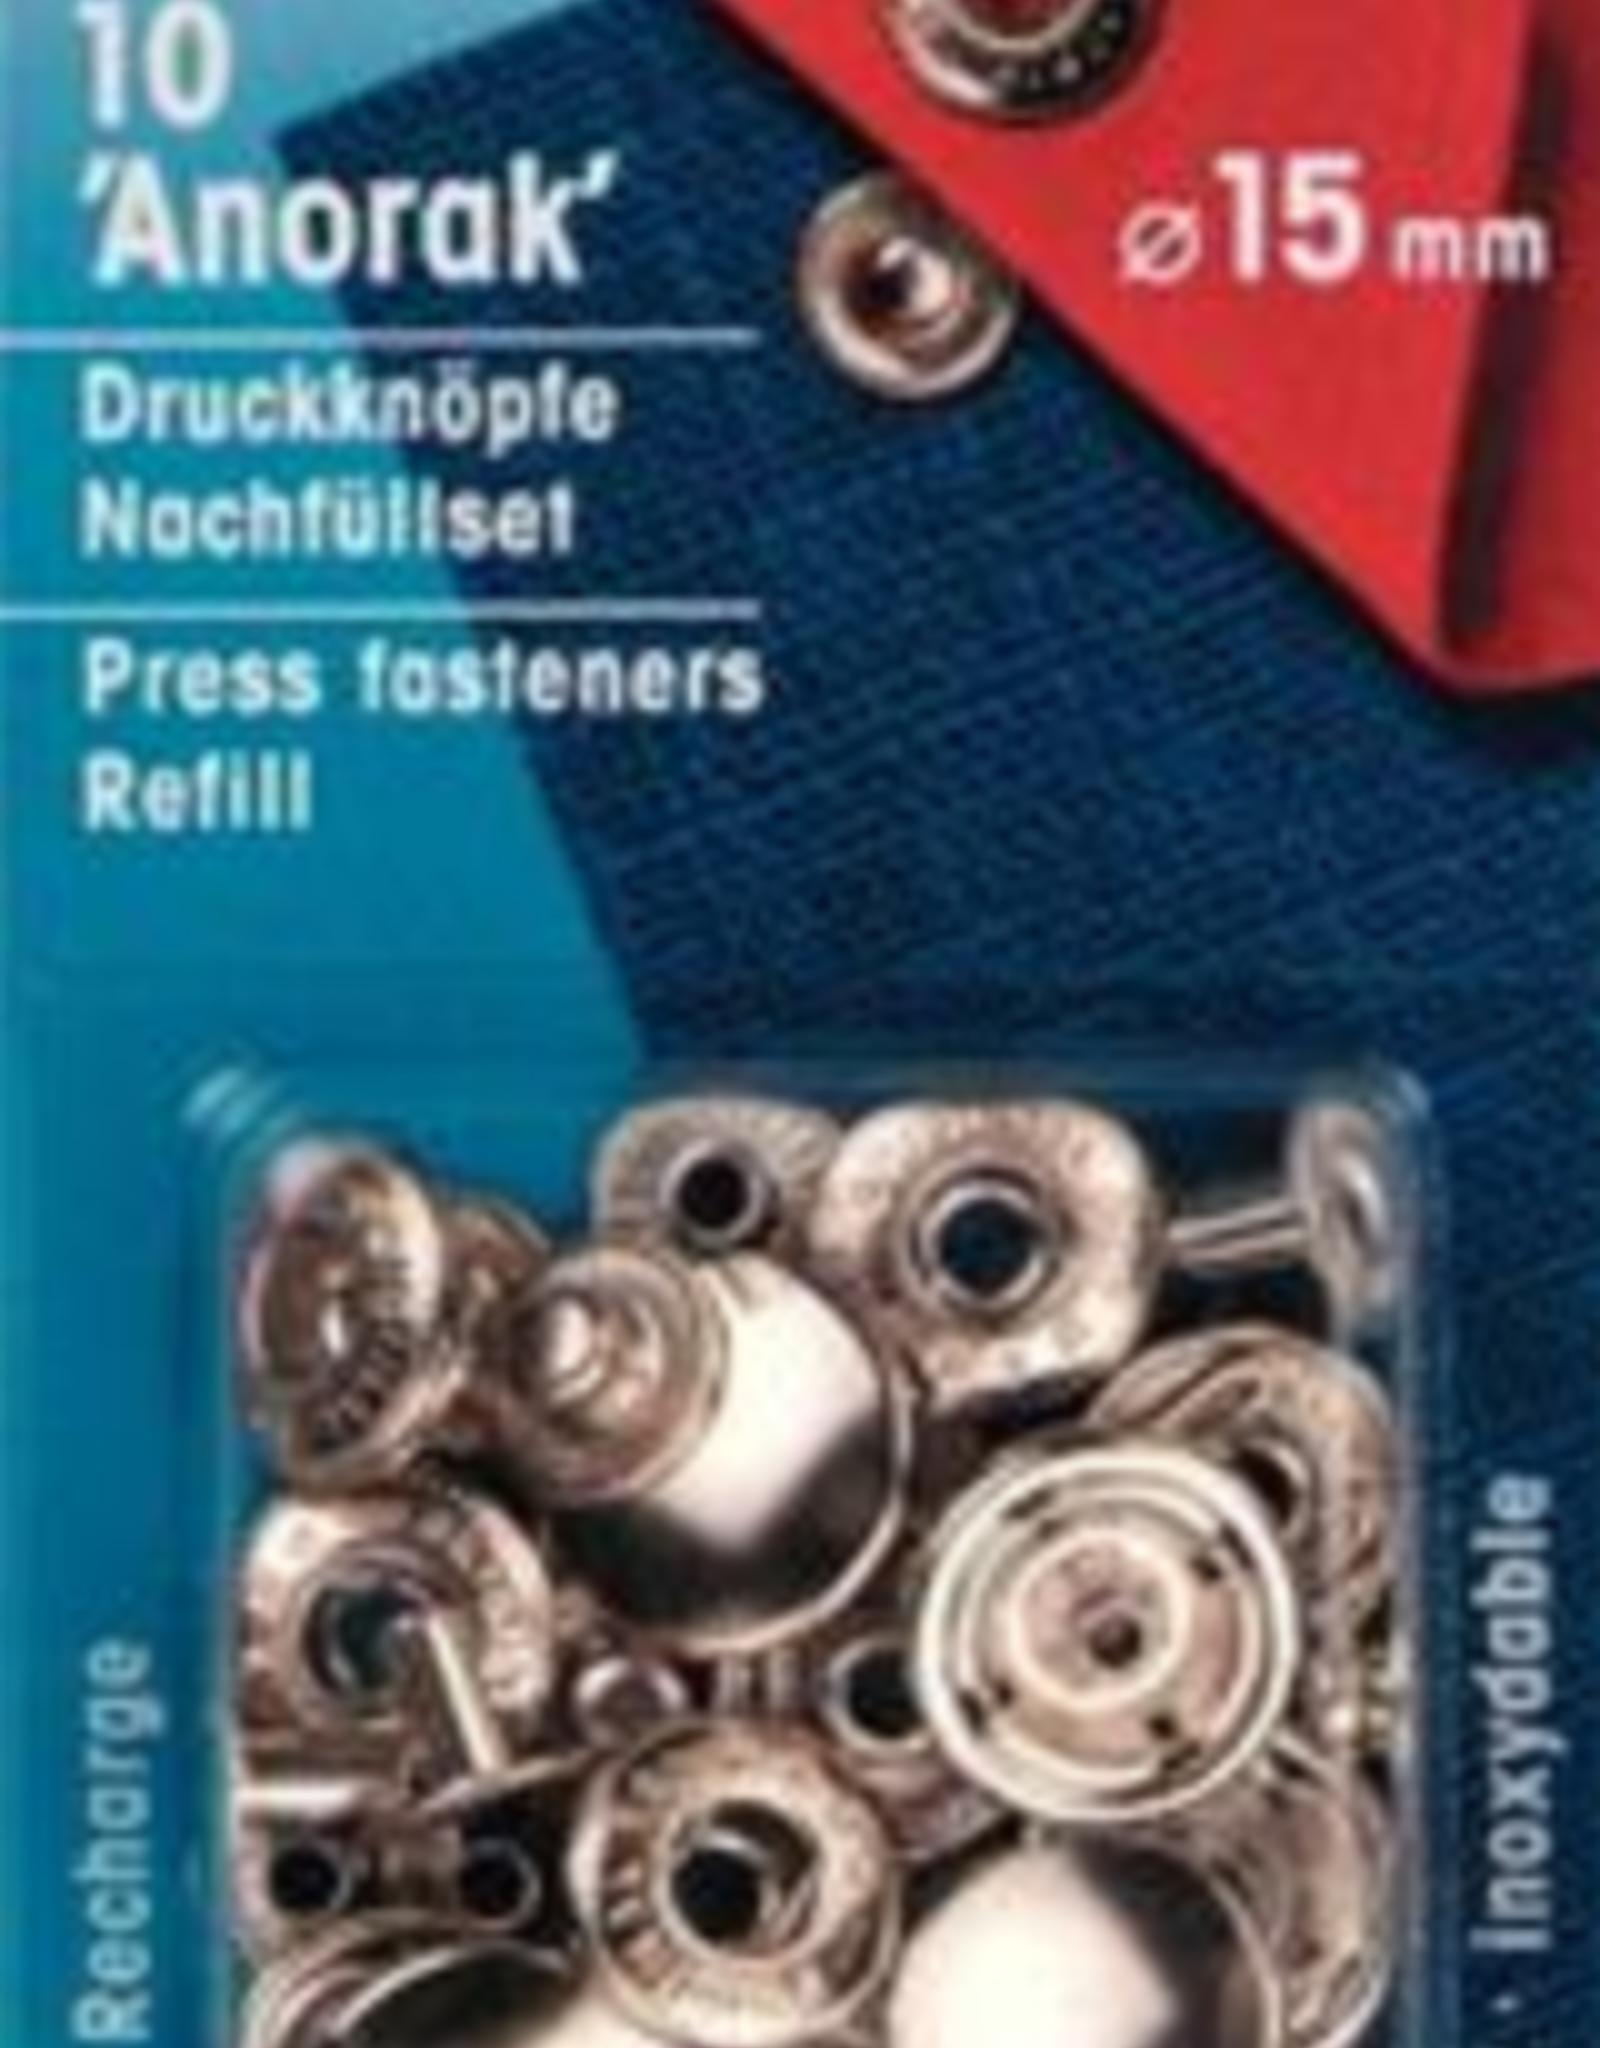 Prym Prym 390.321 - Navulling Anorak drukknopen - 15mm - Zilver